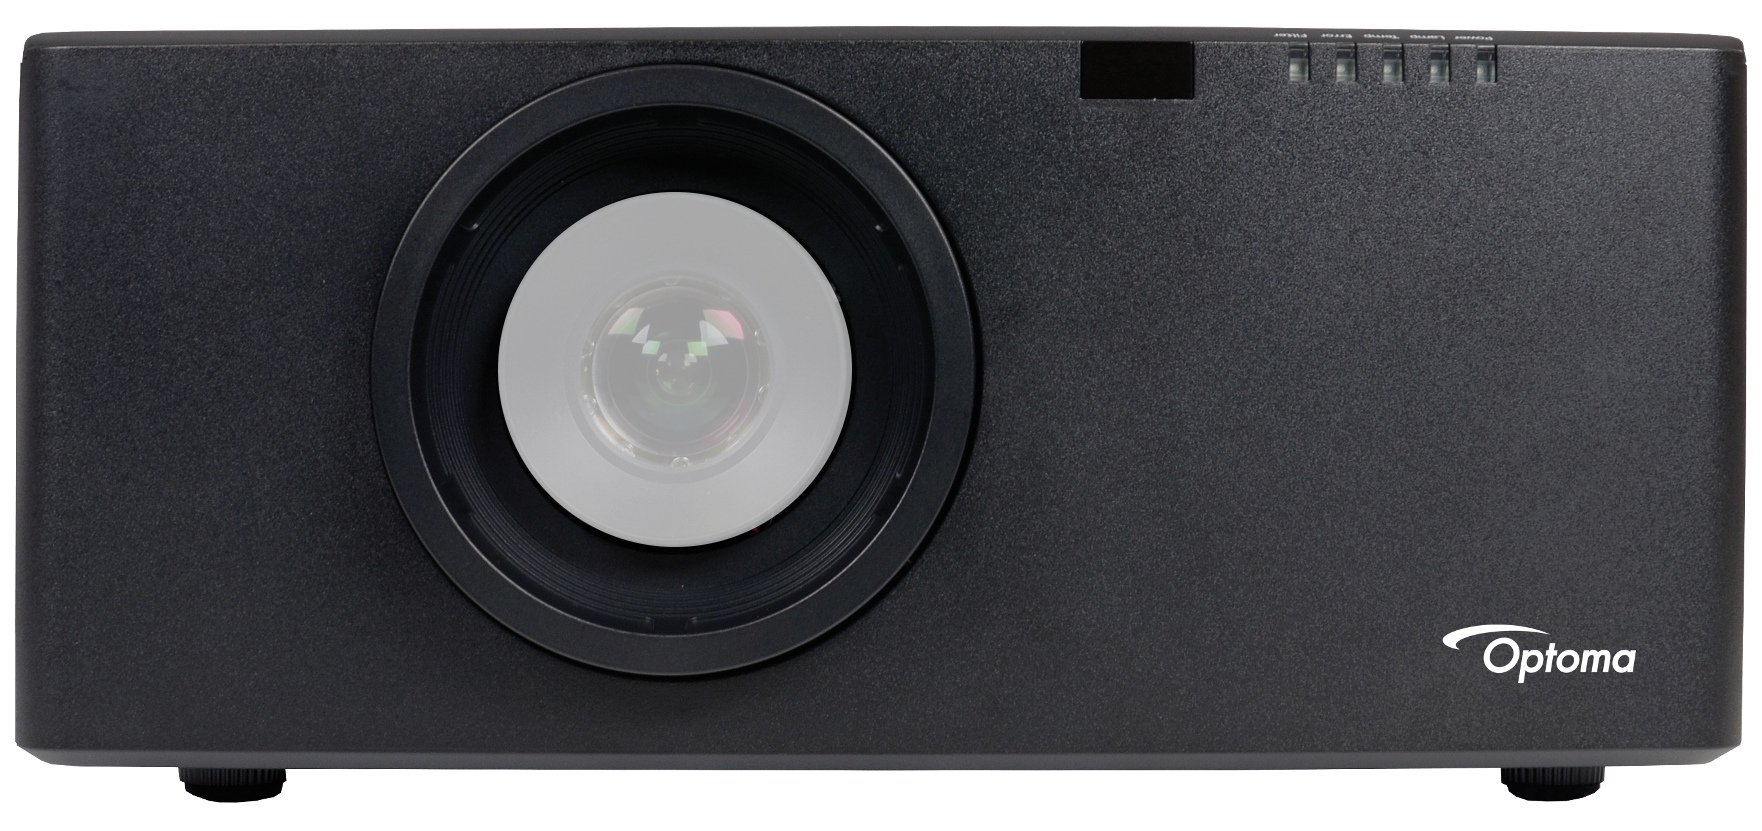 6000 lumen WUXGA DLP Projector, Body Only